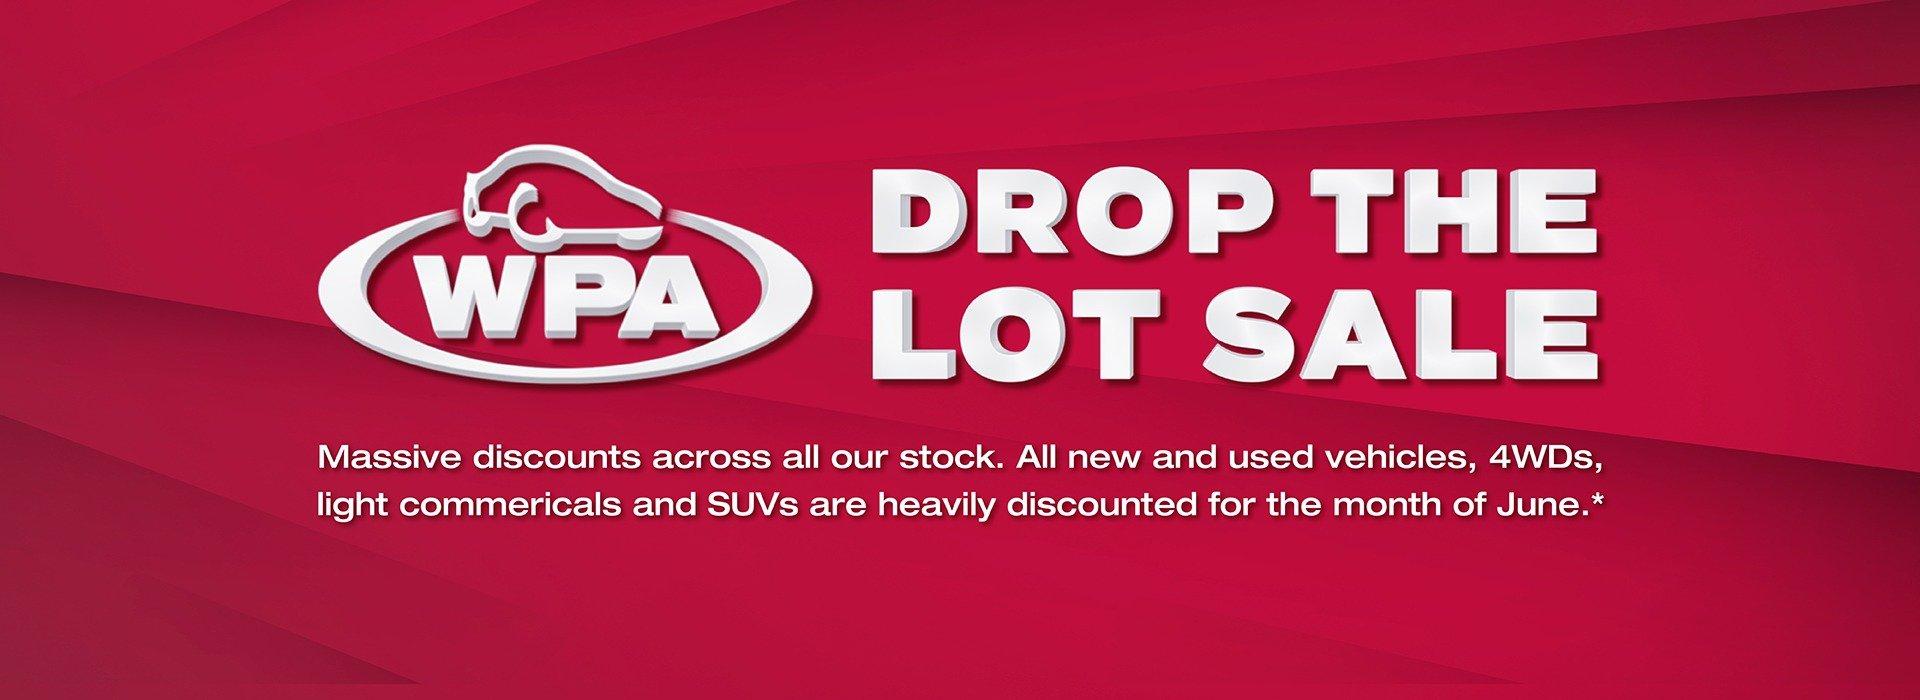 Western Plains Mitsubishi   Drop The Lot Sale Banner